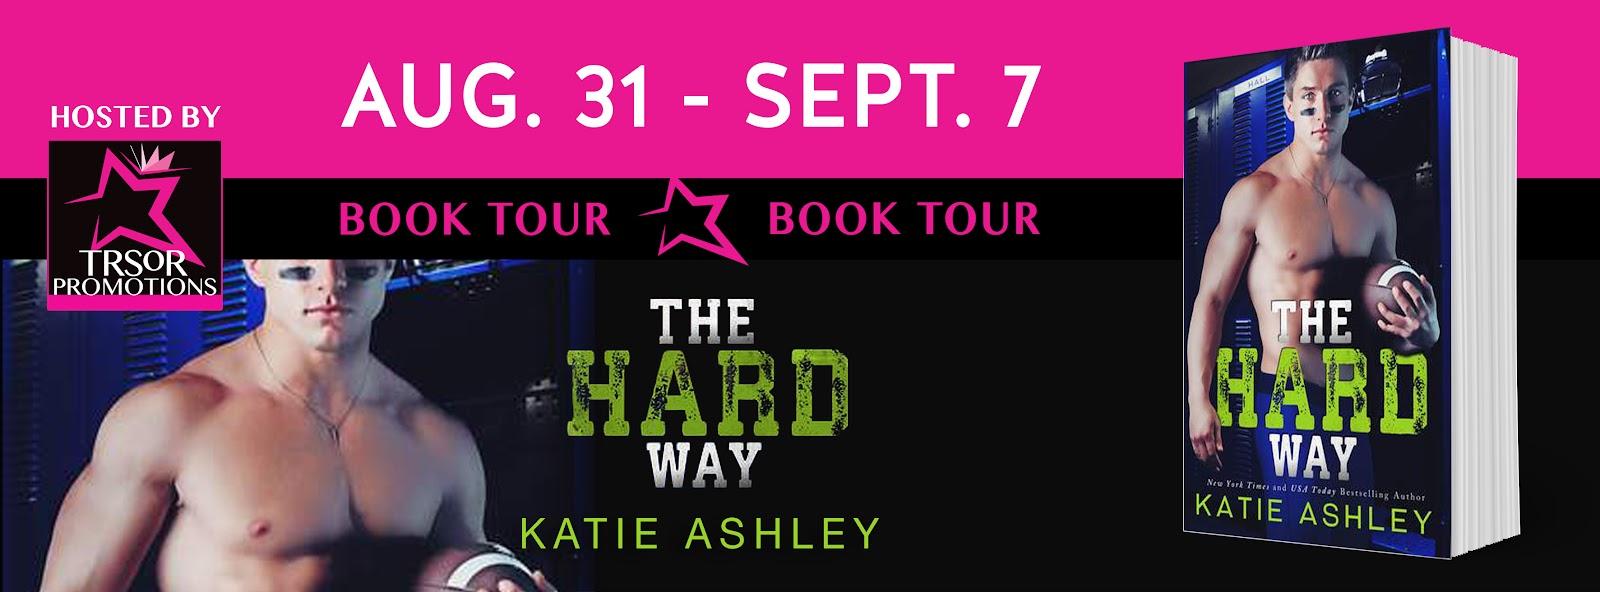 HARDWAY_BOOK_TOUR.jpg